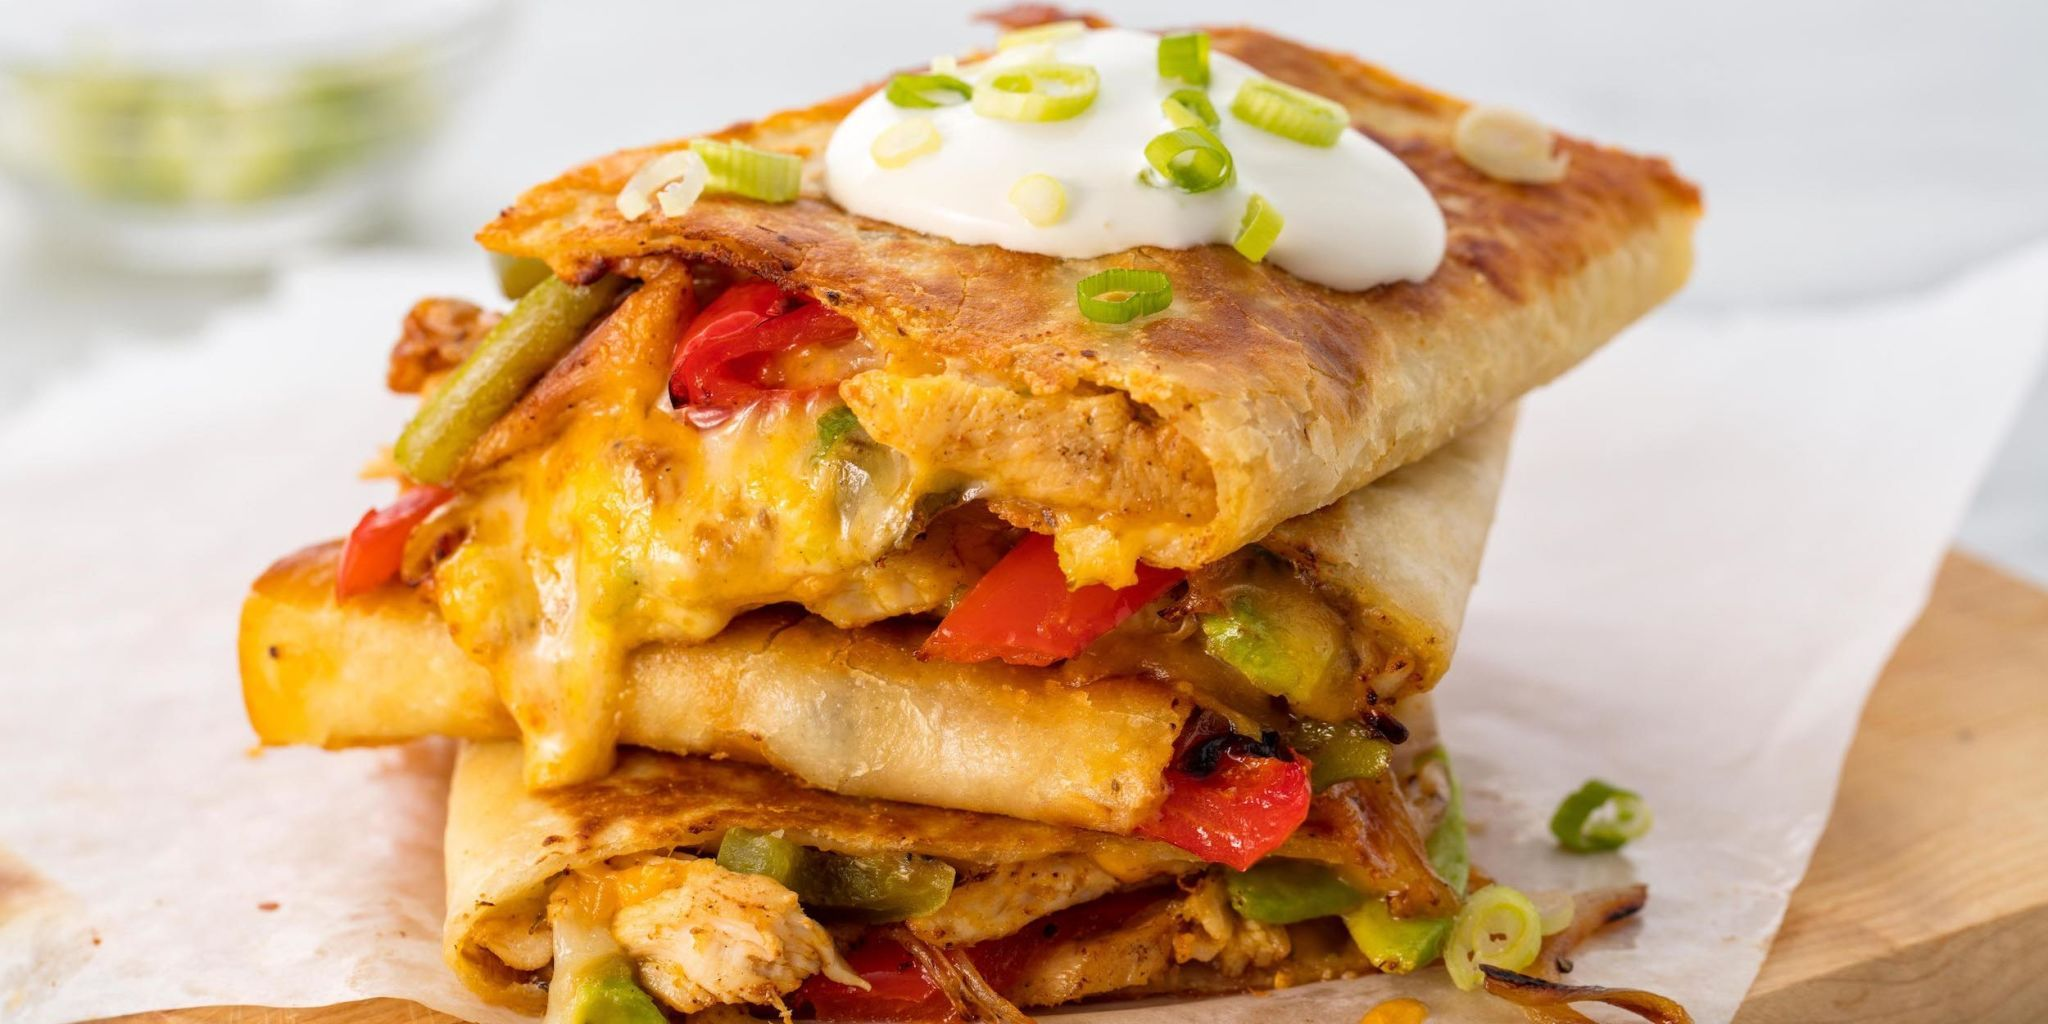 Easy Chicken Quesadilla Recipe - How to Make The Best Chicken Quesadillas